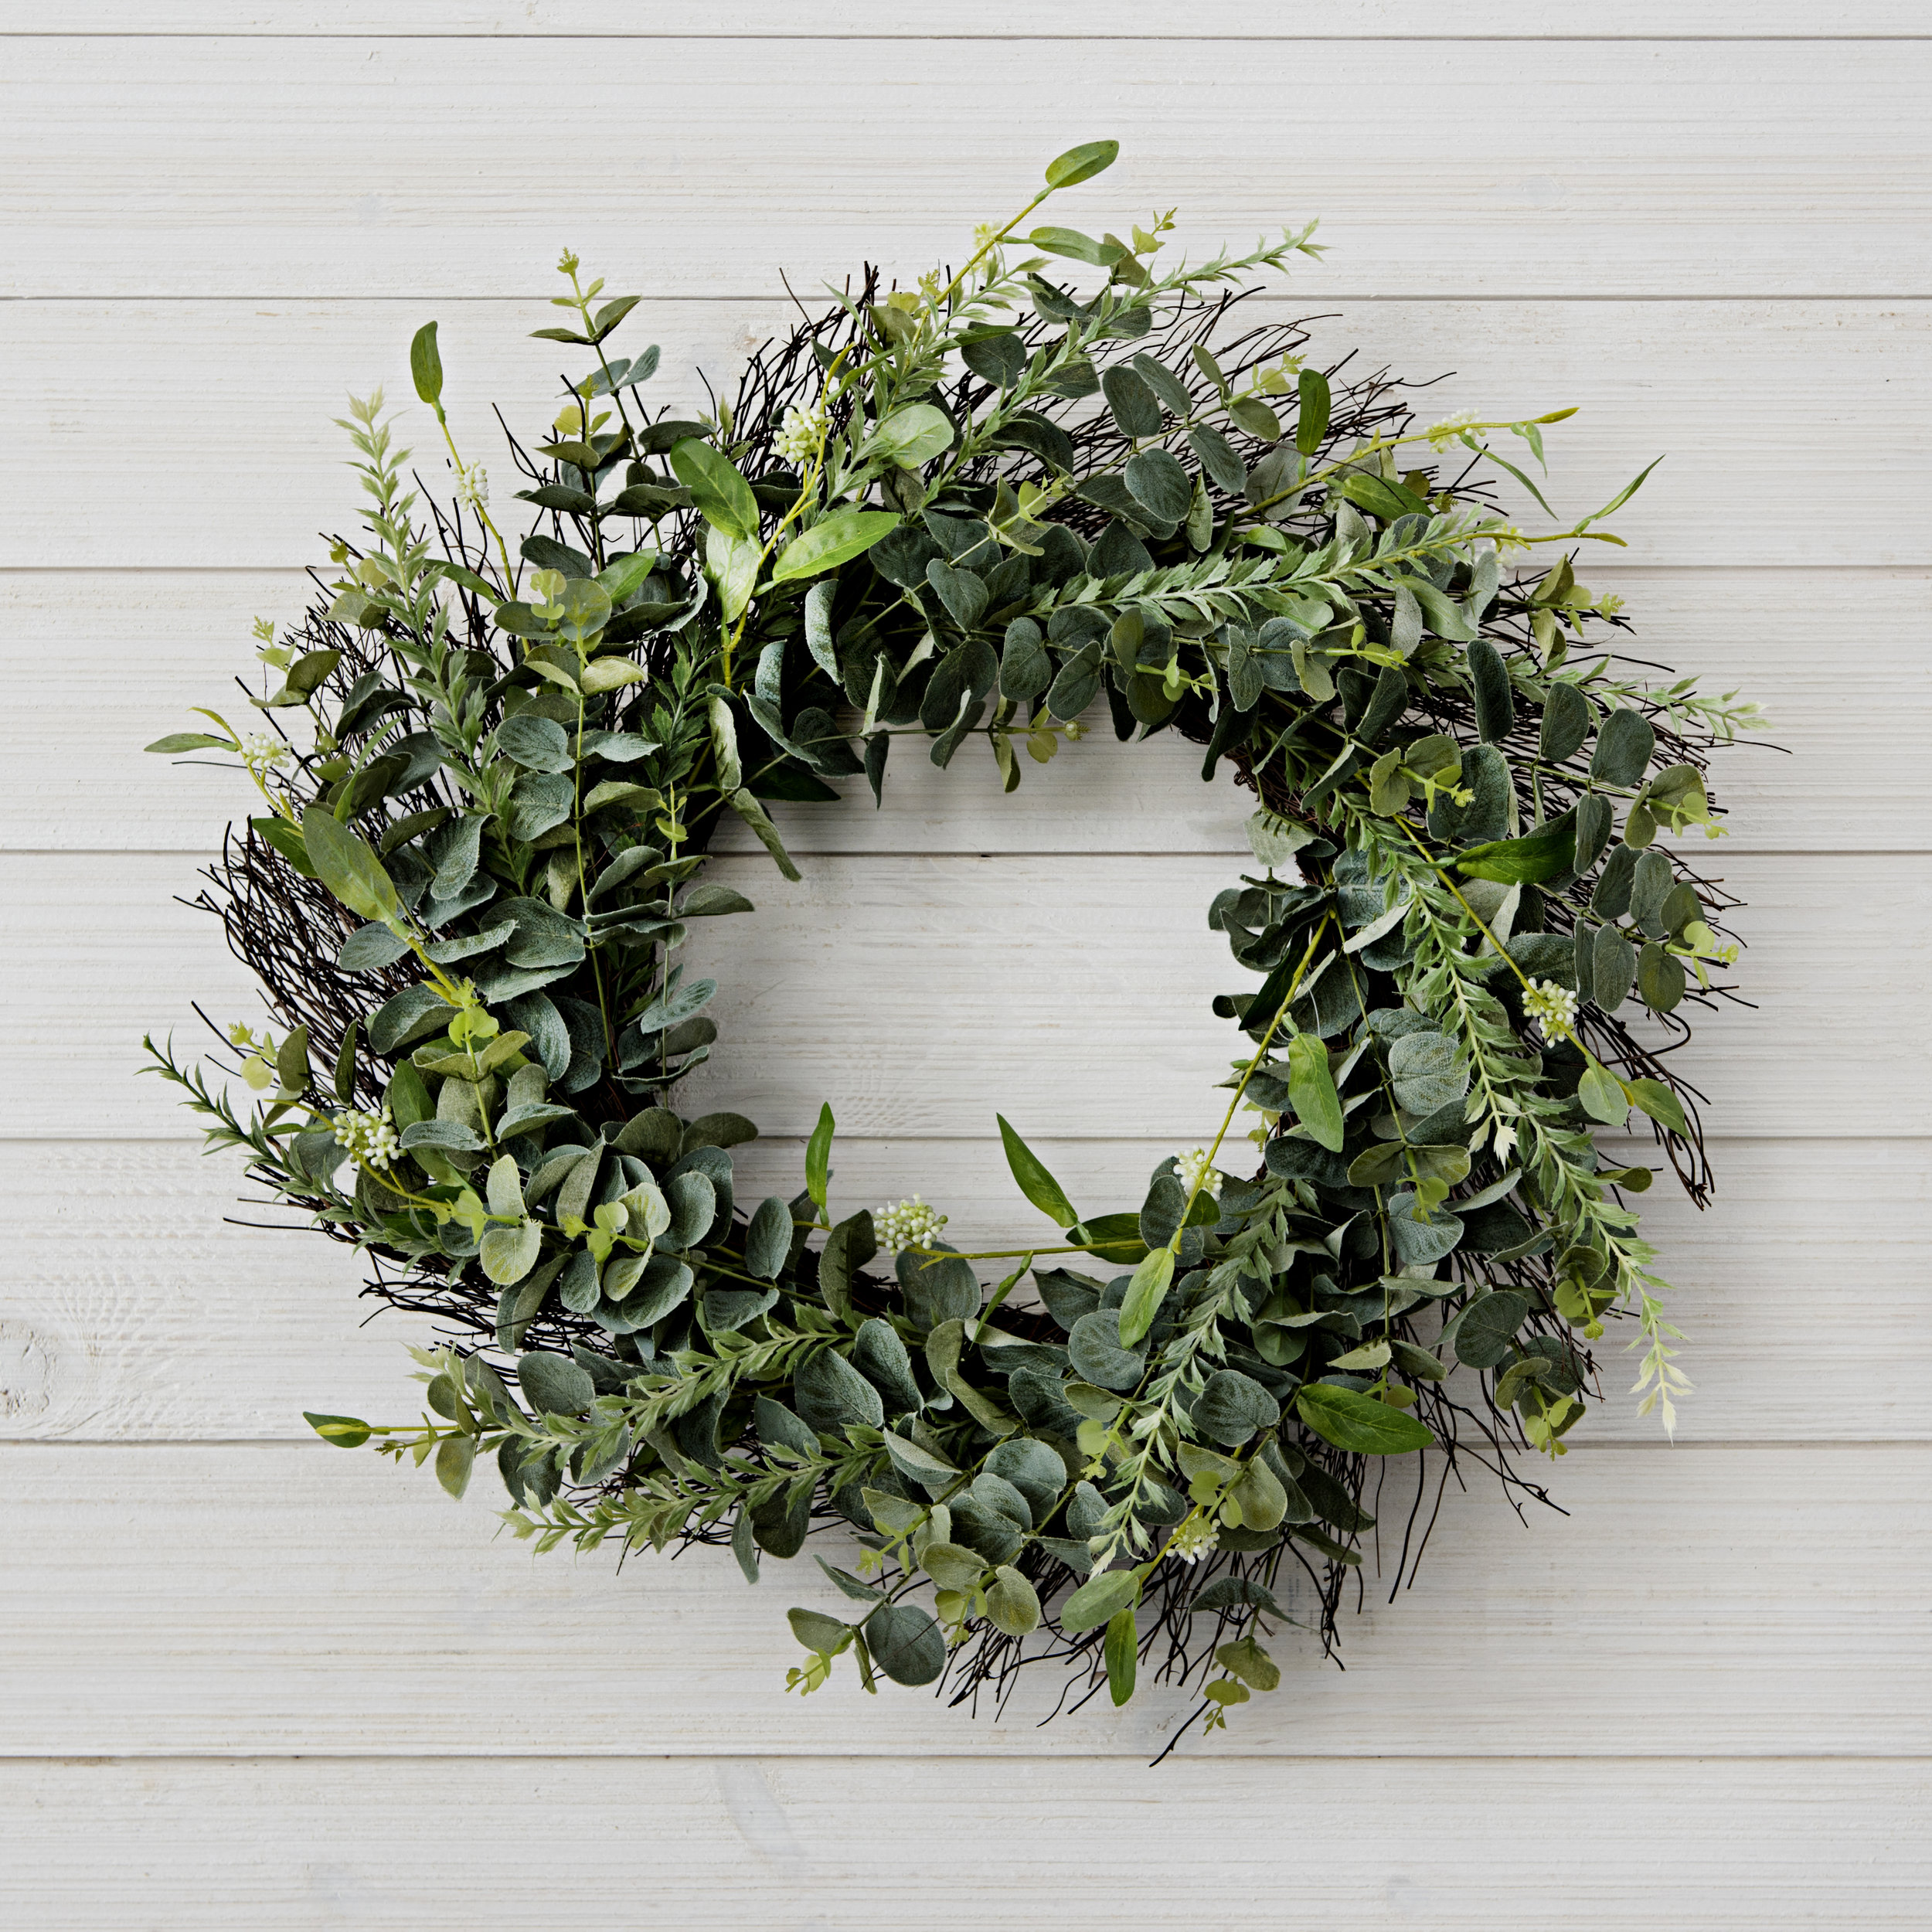 Kirkland's - Wreaths